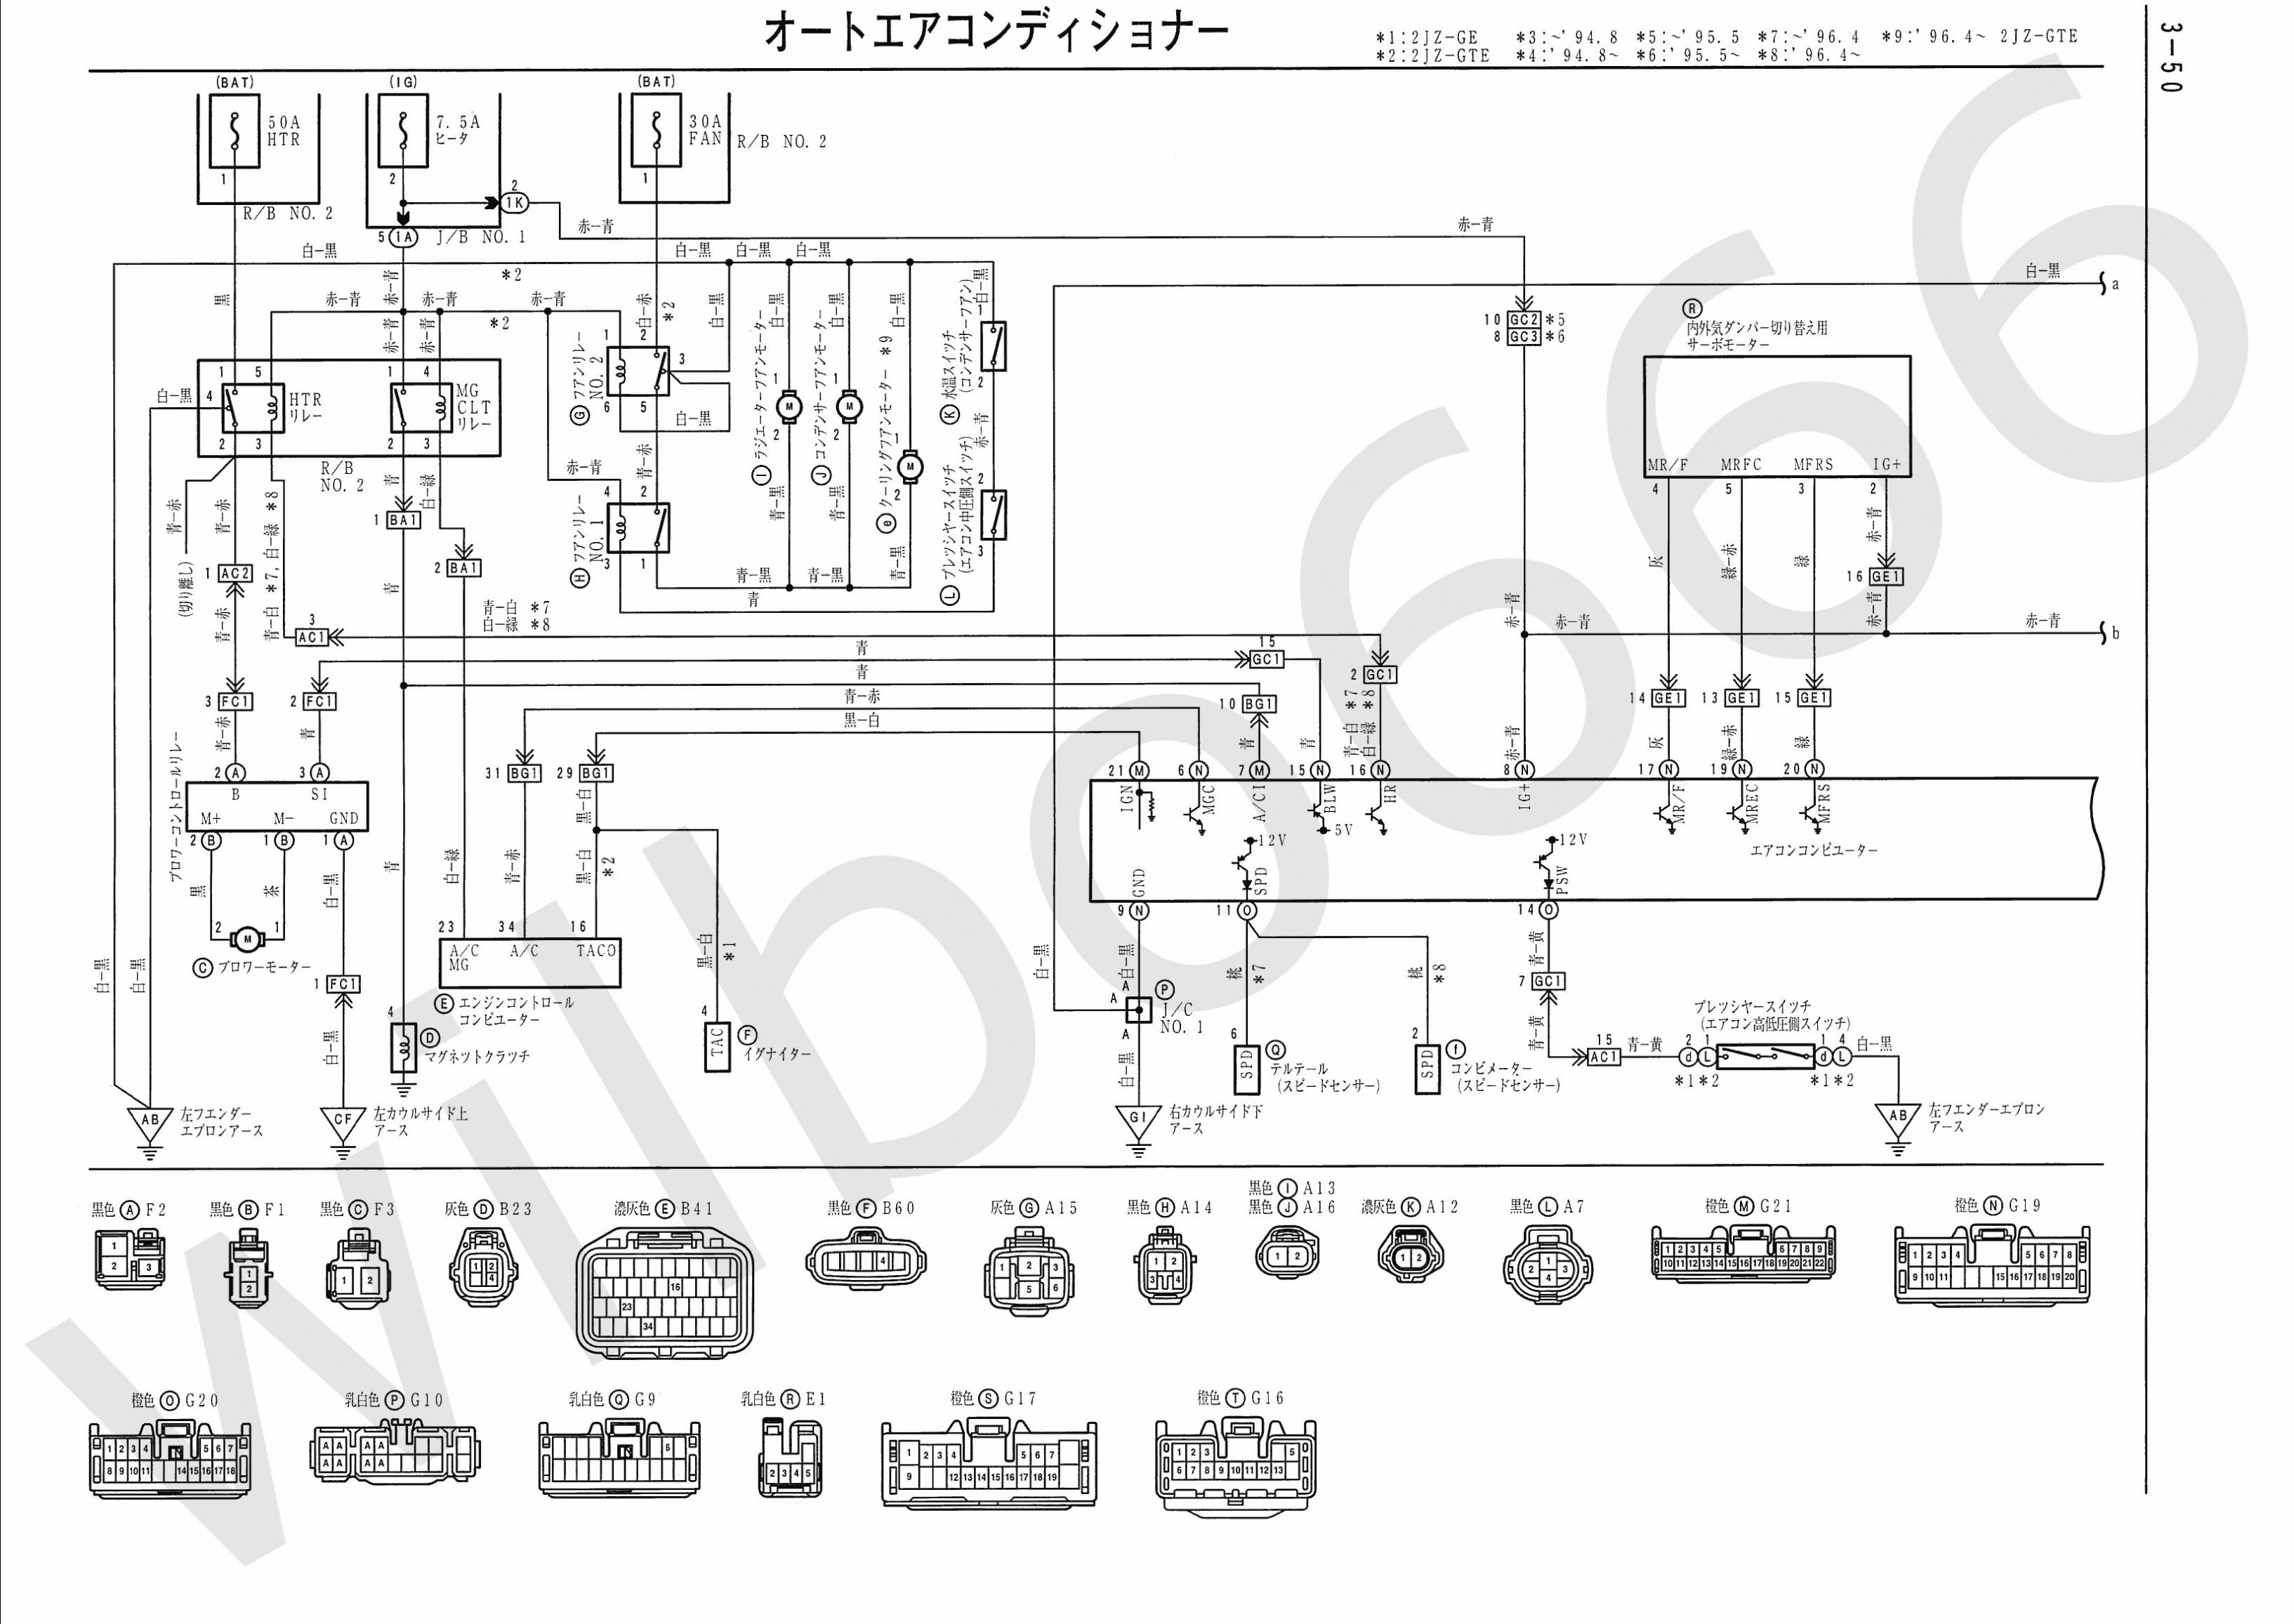 1999 Honda Accord Engine Diagram 1998 Civic Engine Diagram Layout Wiring Diagrams • Of 1999 Honda Accord Engine Diagram